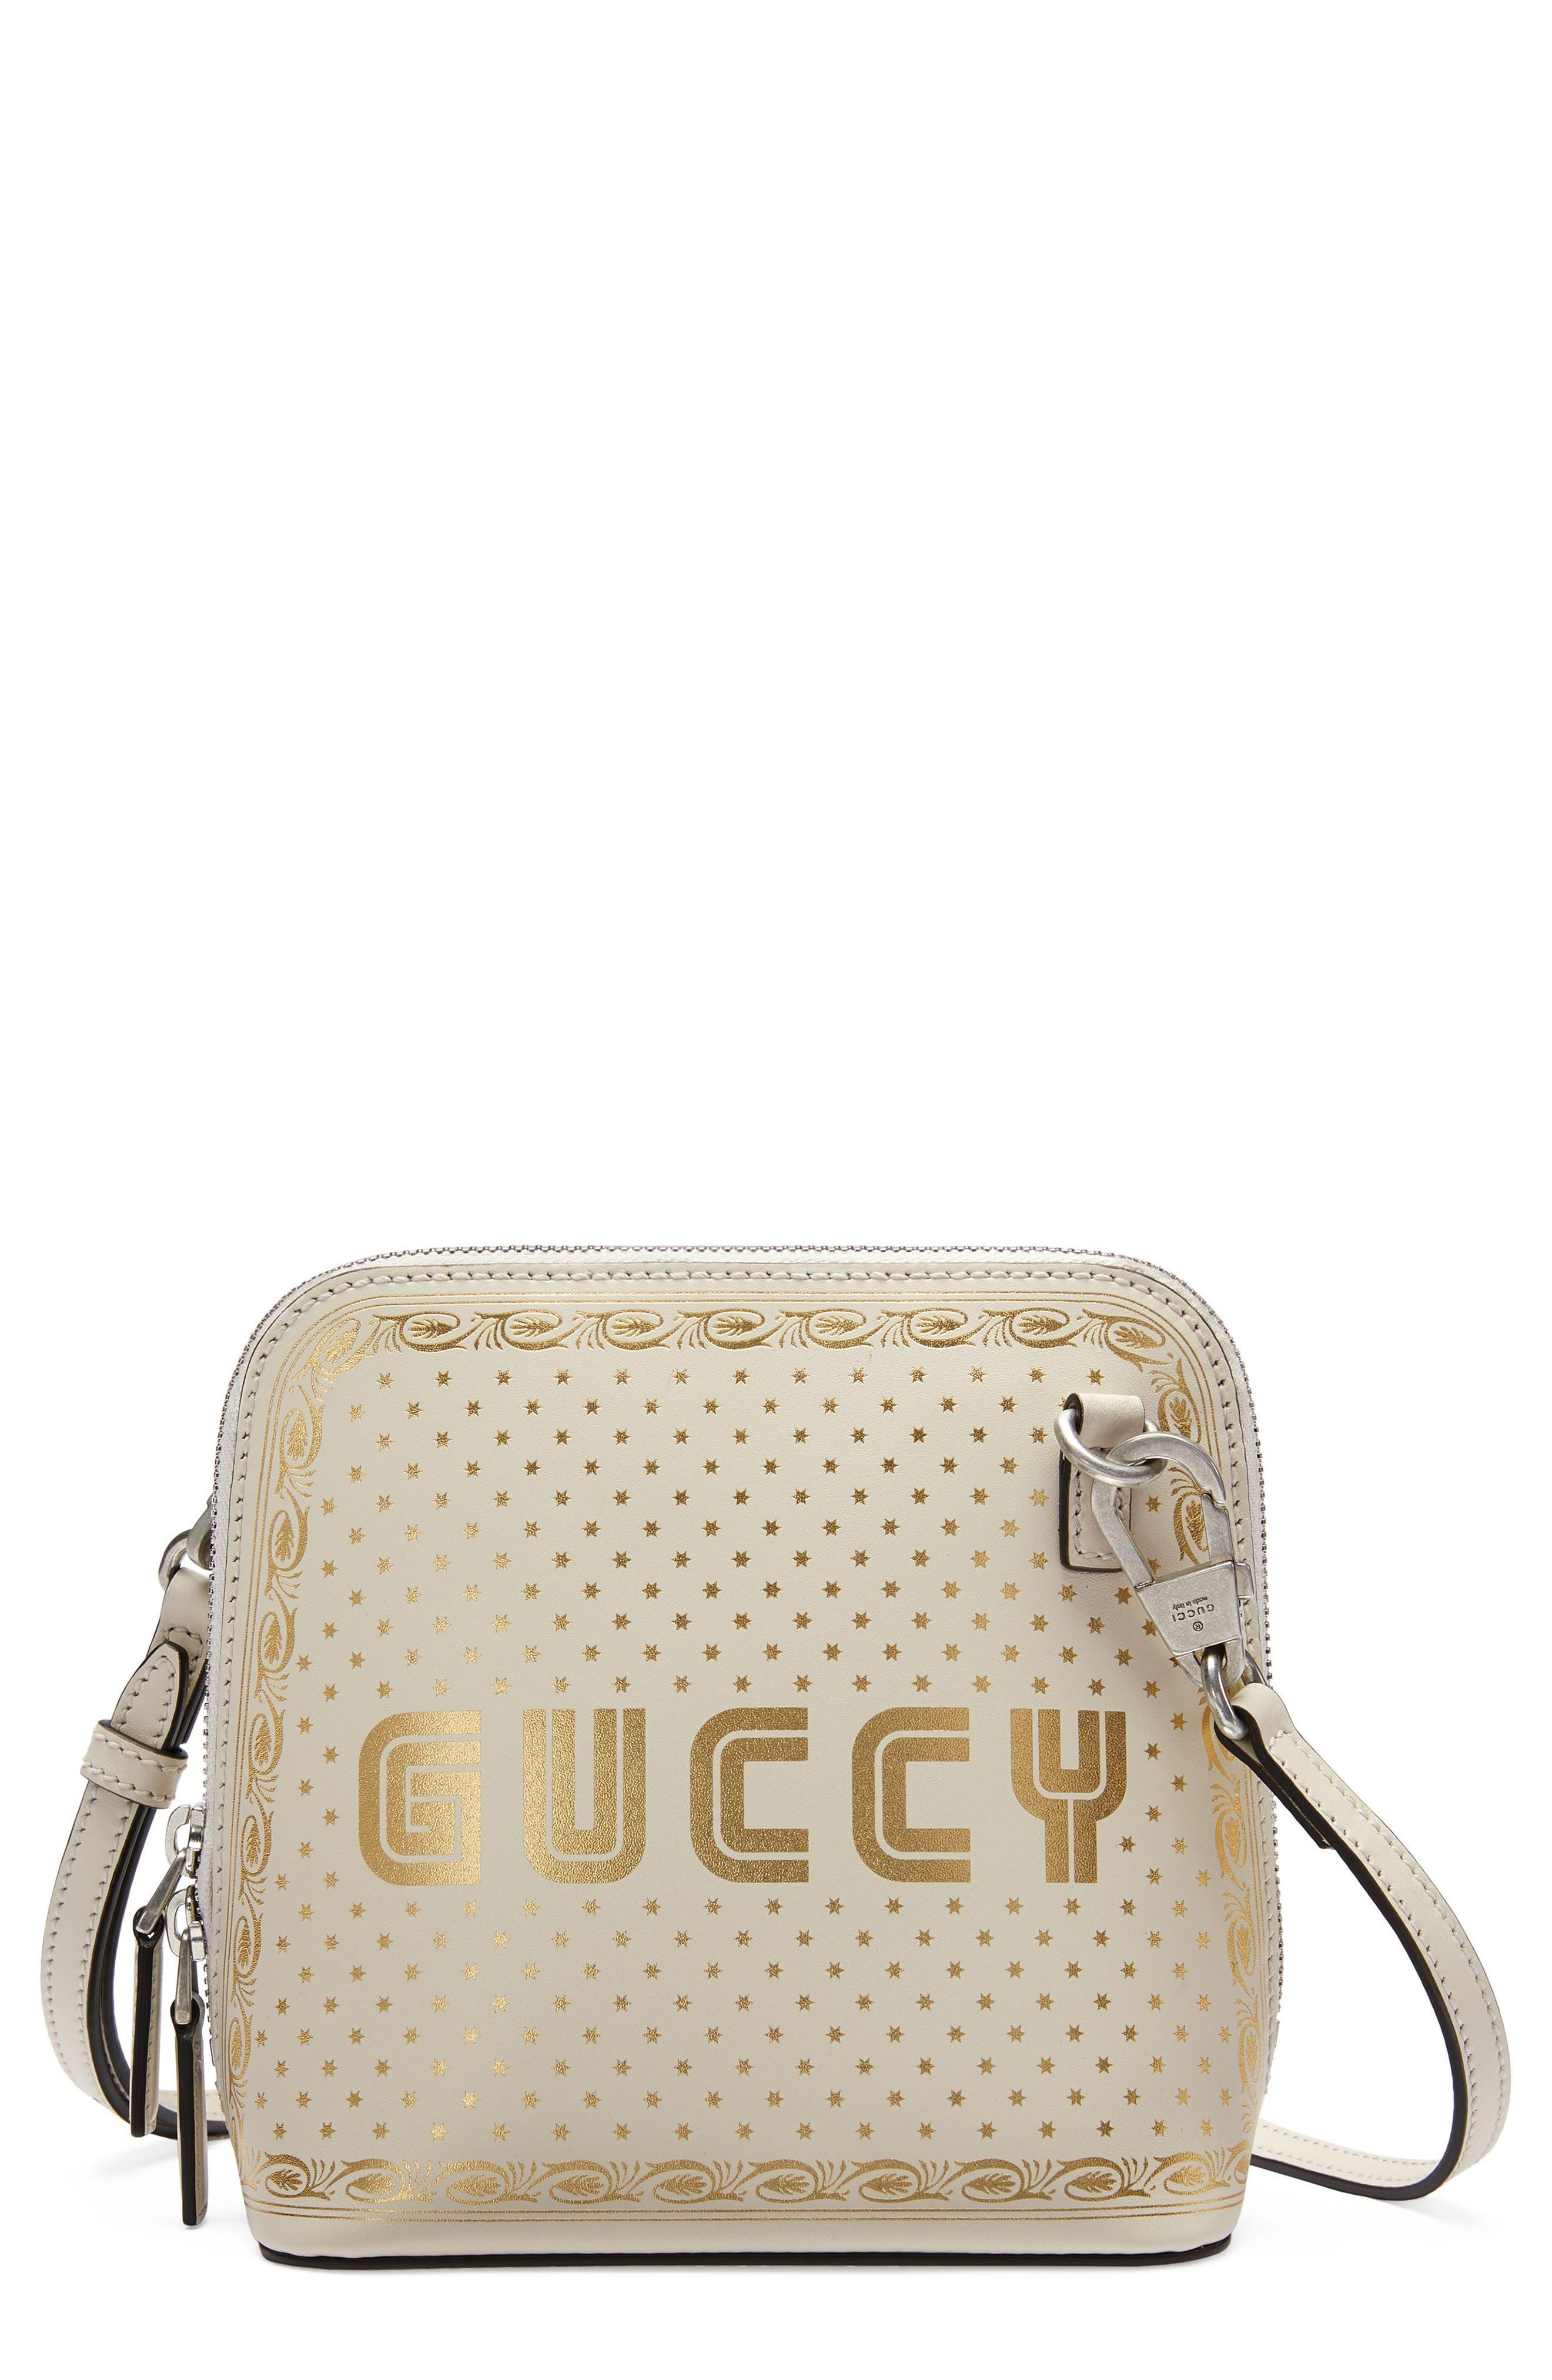 Main Image - Gucci Guccy Logo Moon & Stars Leather Crossbody Bag